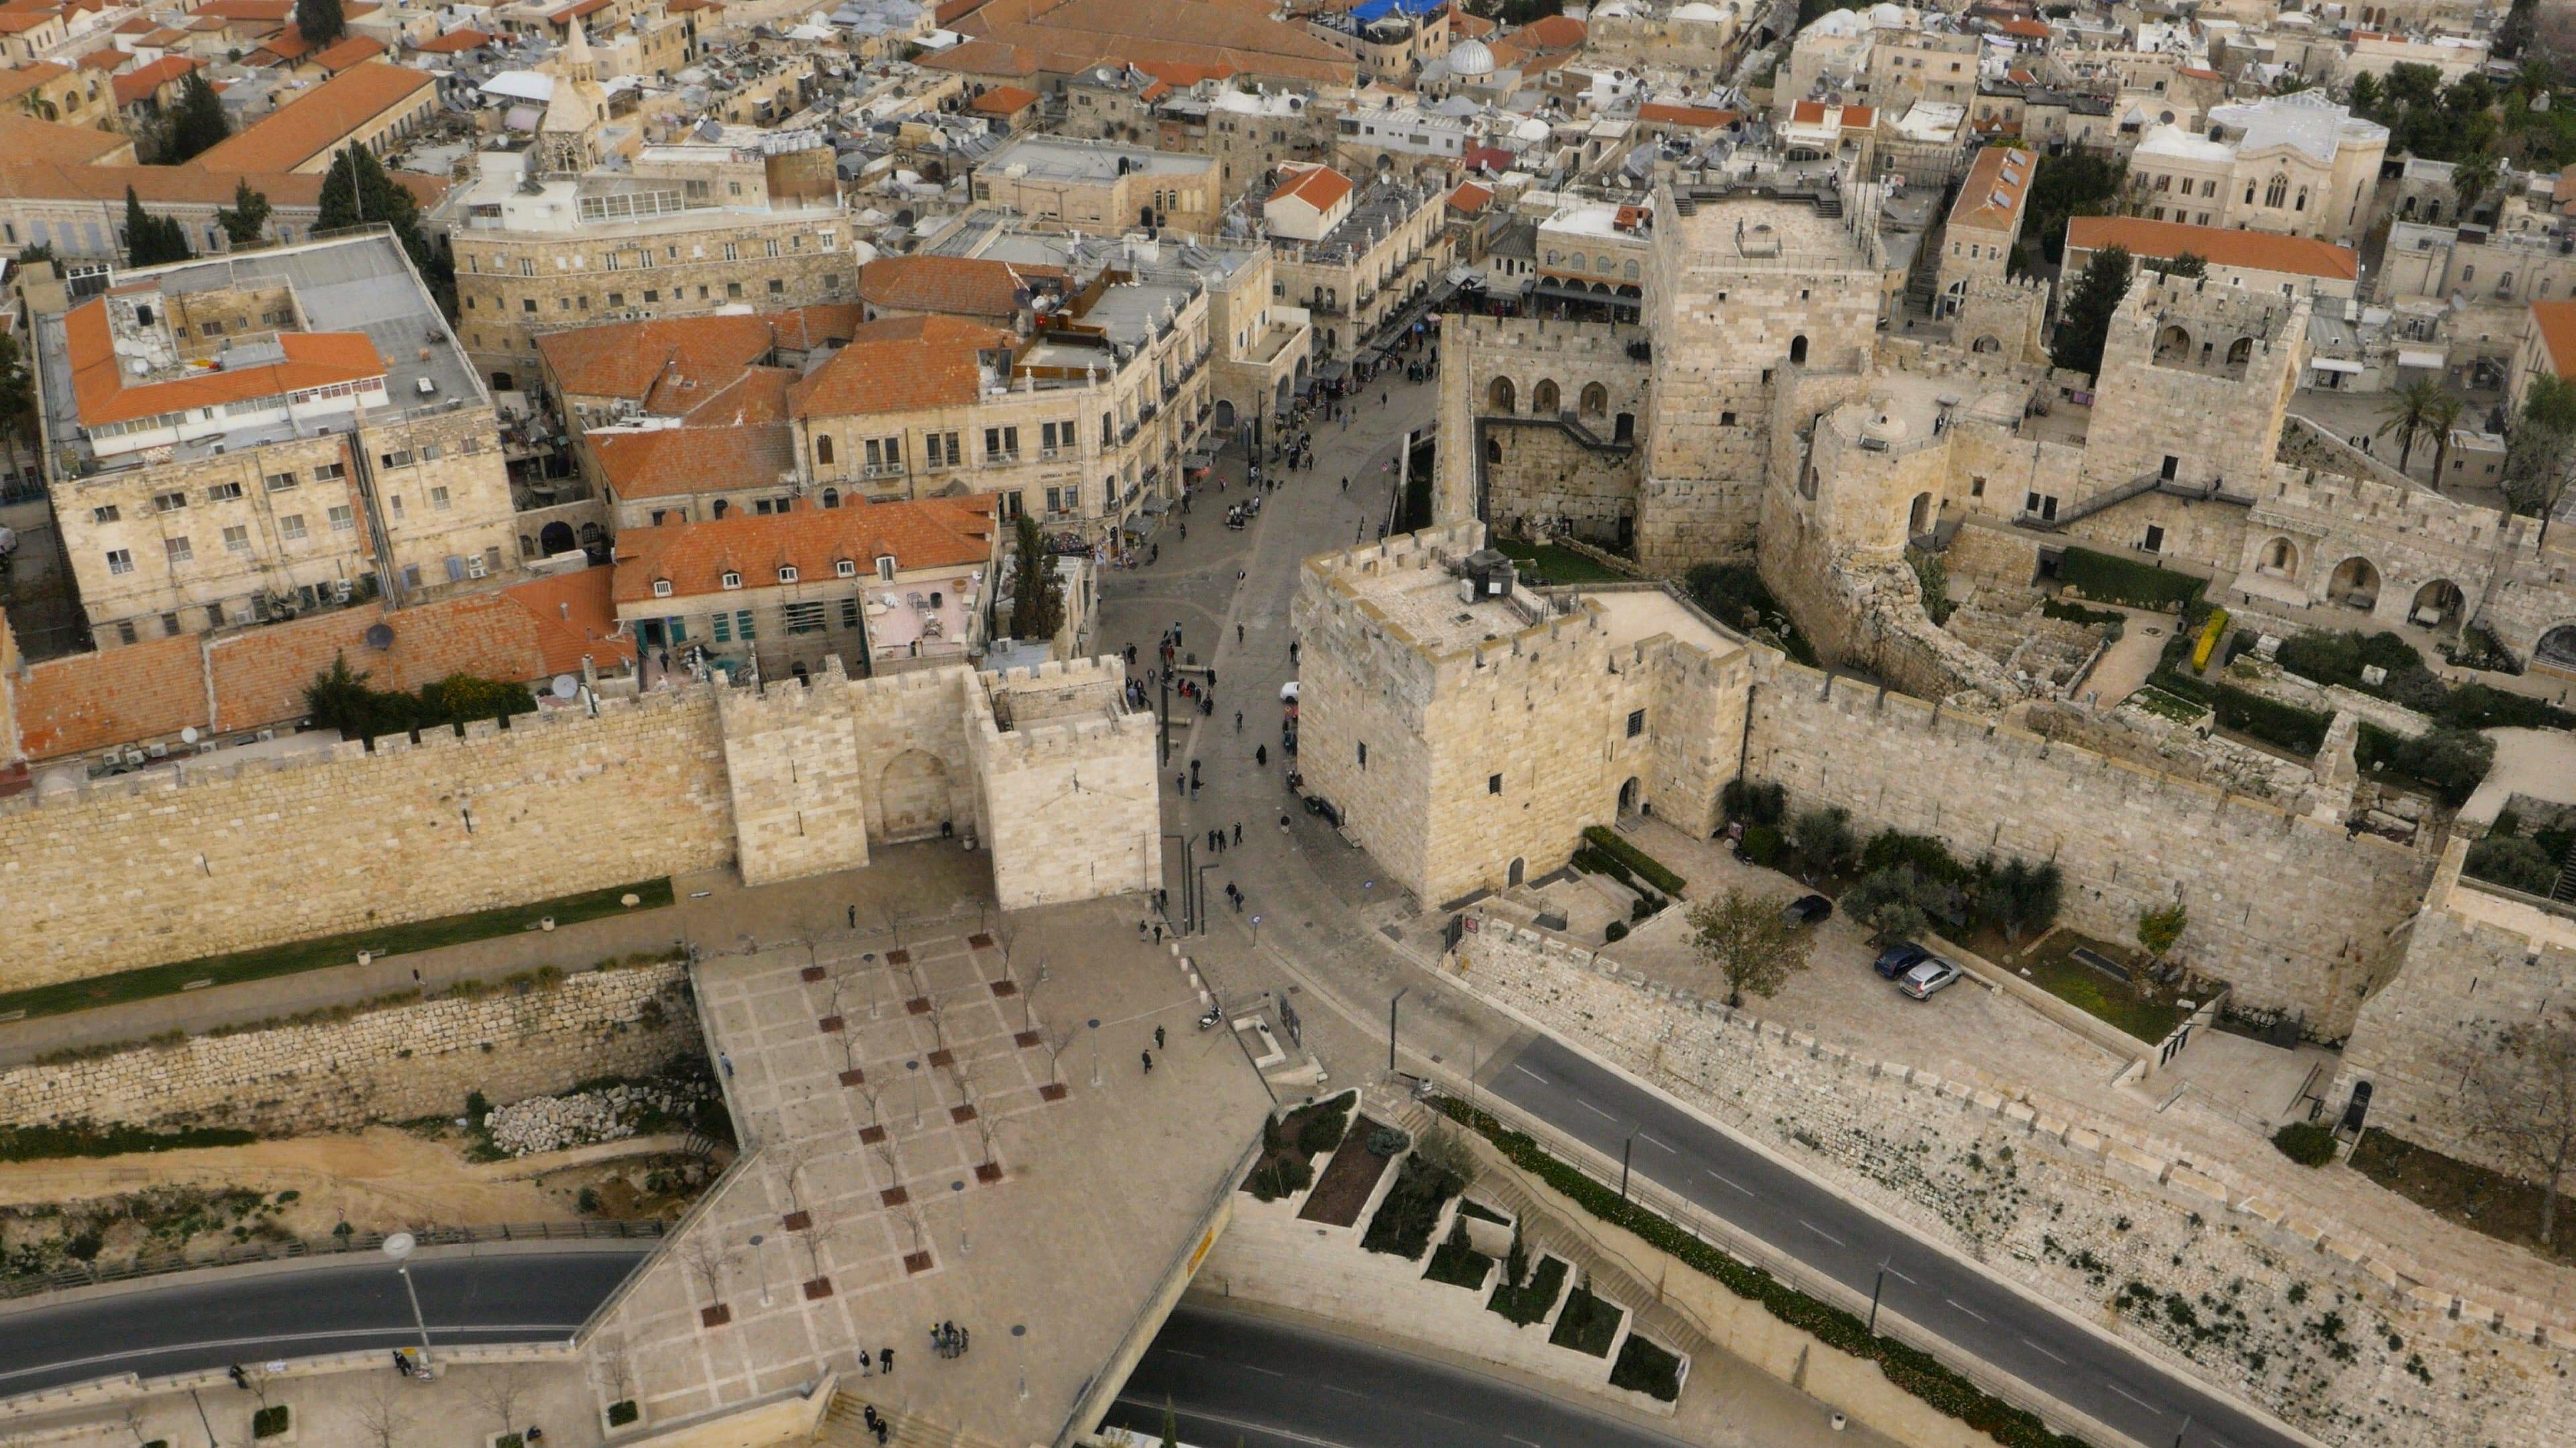 Drone filming in Israel